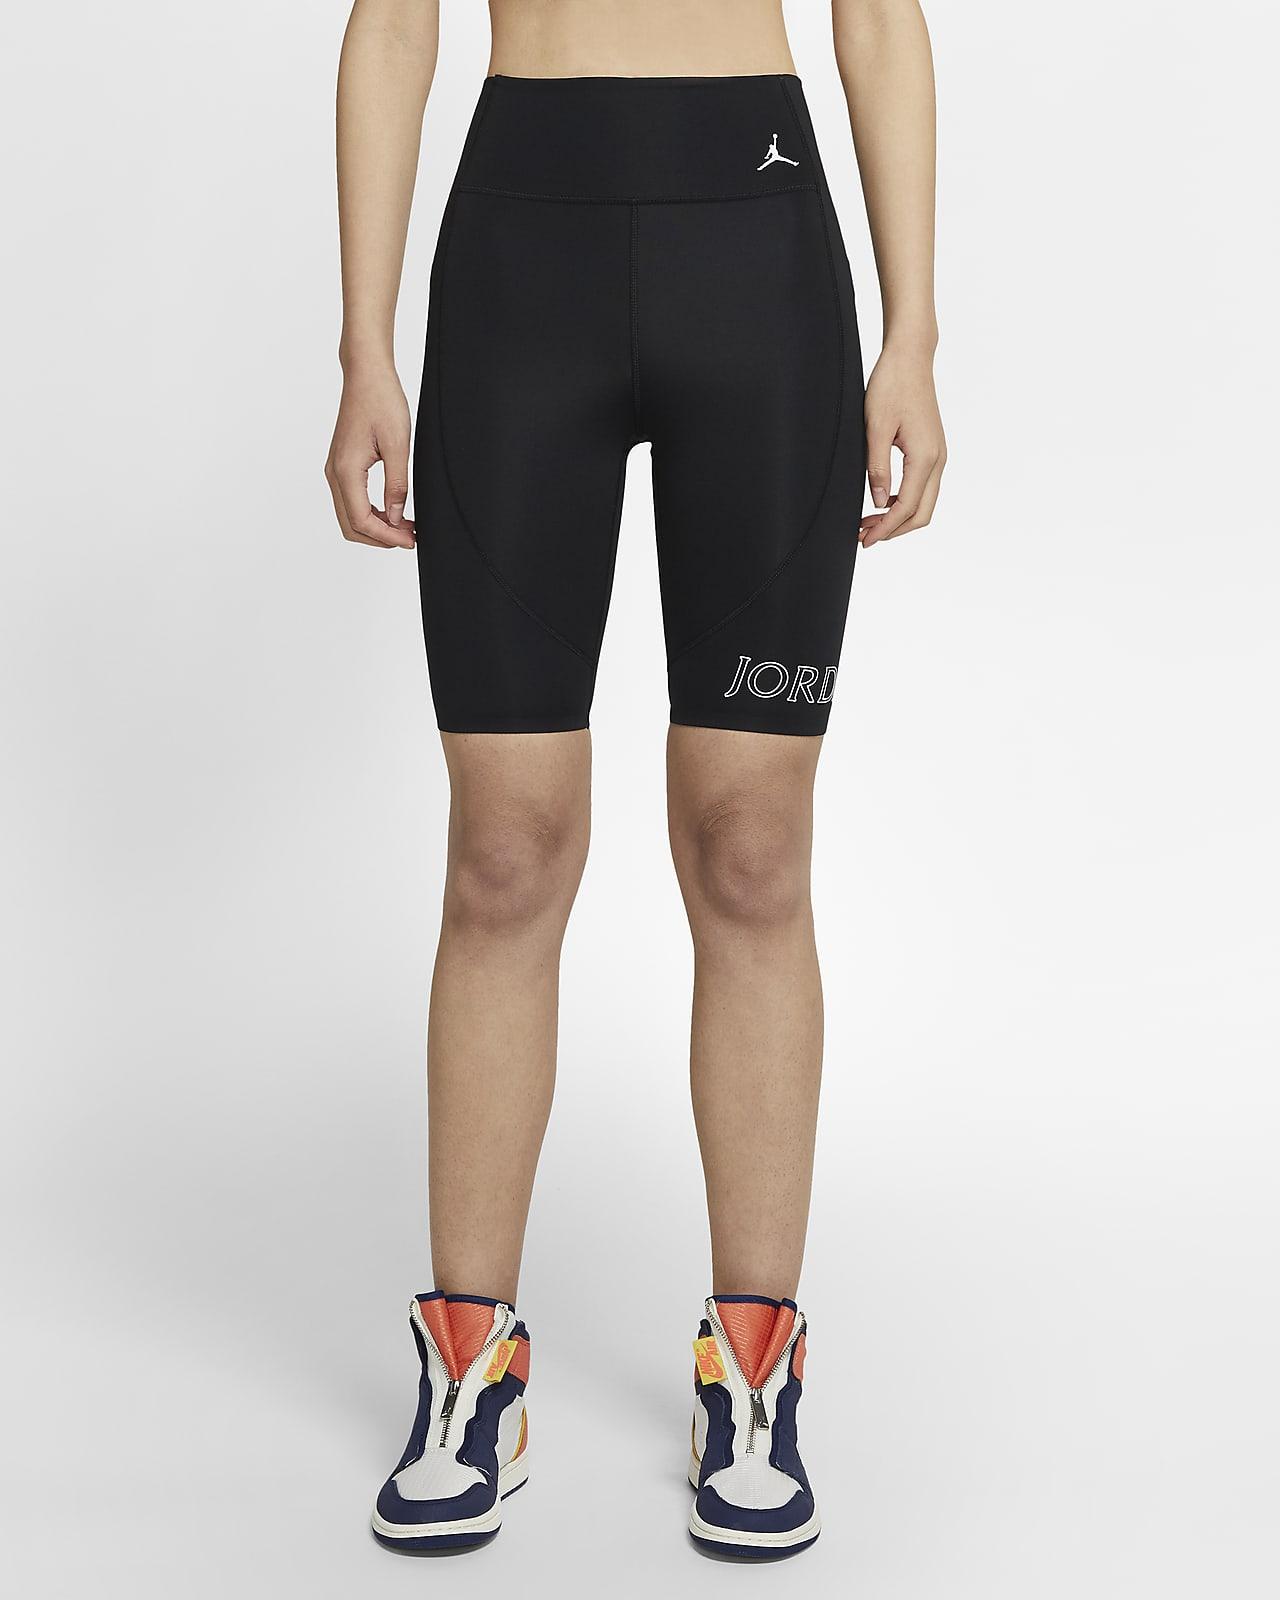 Jordan Utility Women's Bike Shorts